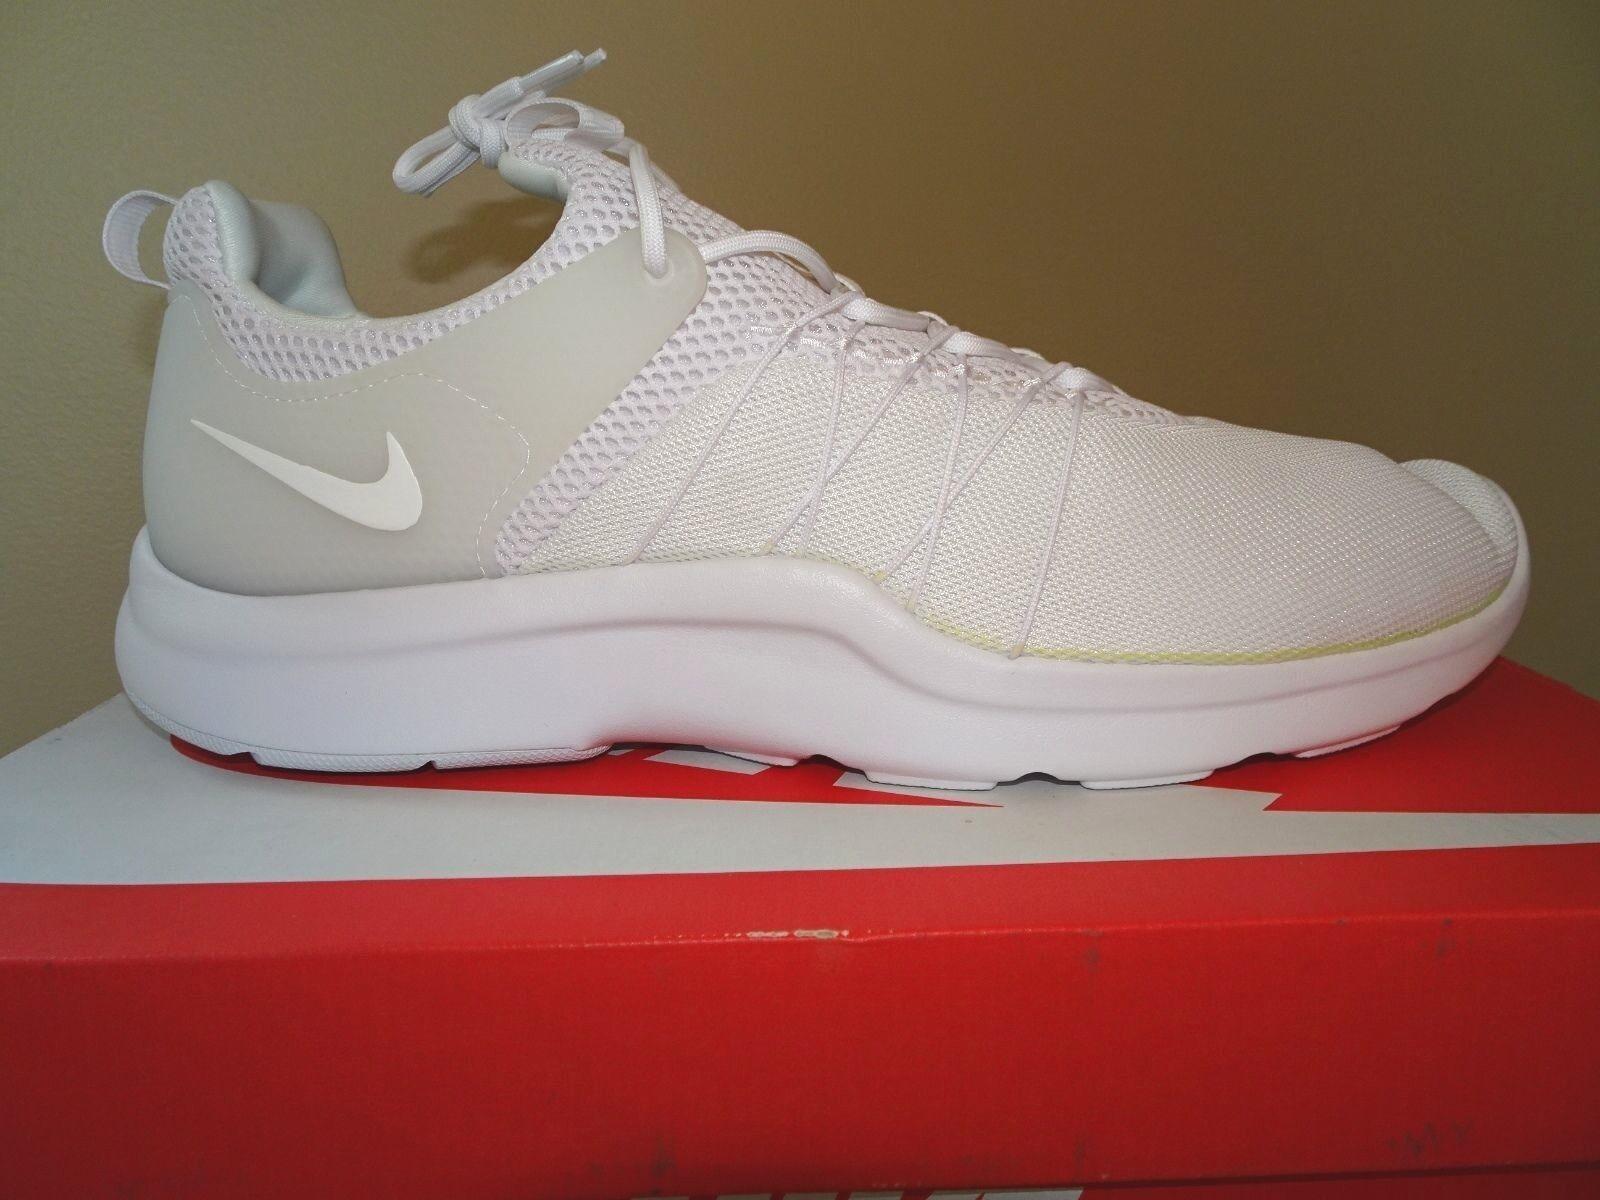 Nwd uomini nike darwin scarpa da corsa - maglie bianco bianco maglie - 5, 7,5, 13 e 15 7253fd